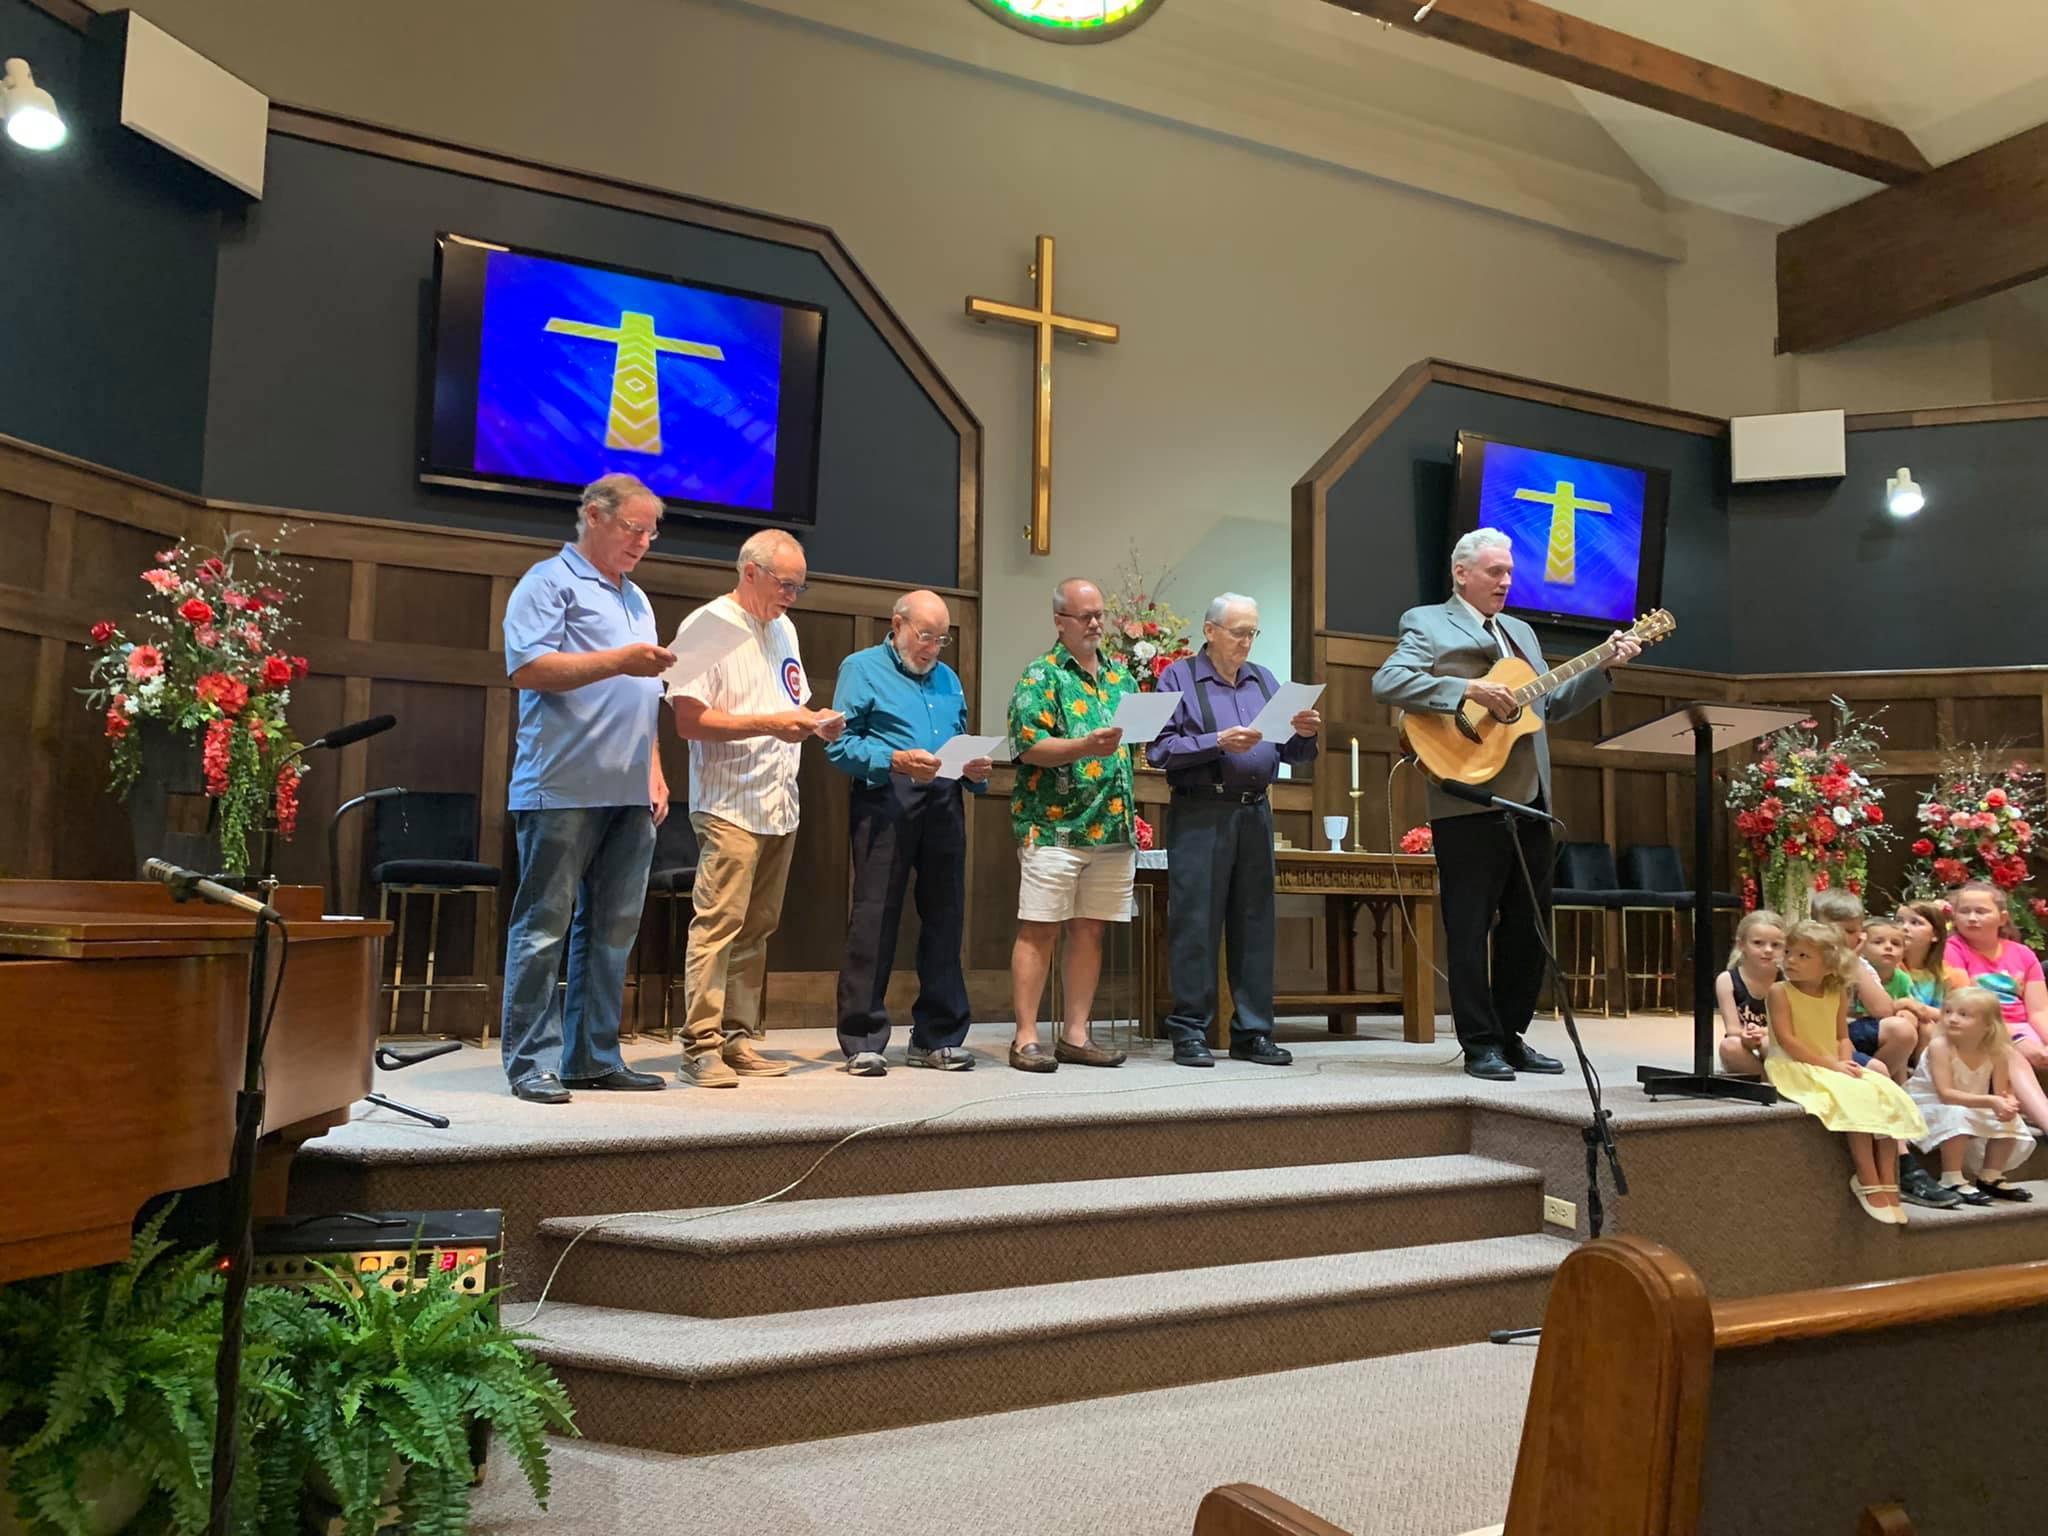 worship music sung in a church on a sunday in girard illinois